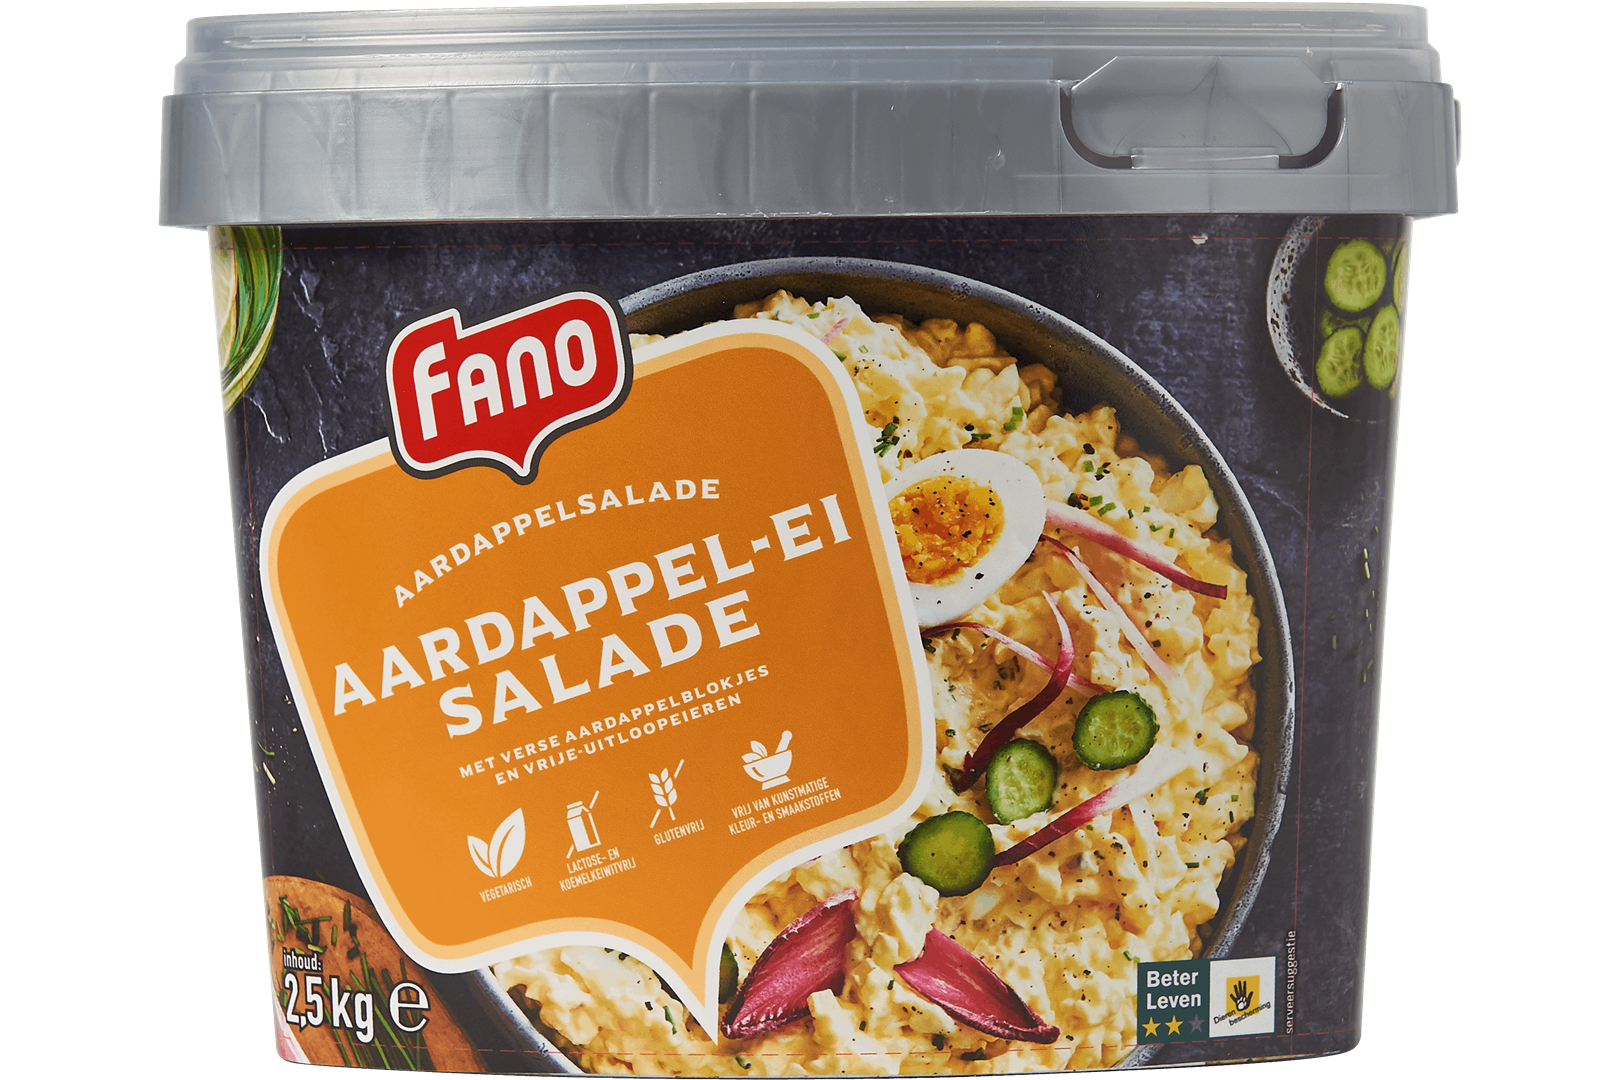 Productafbeelding FANO Aardappel Ei Salade 2.5kg